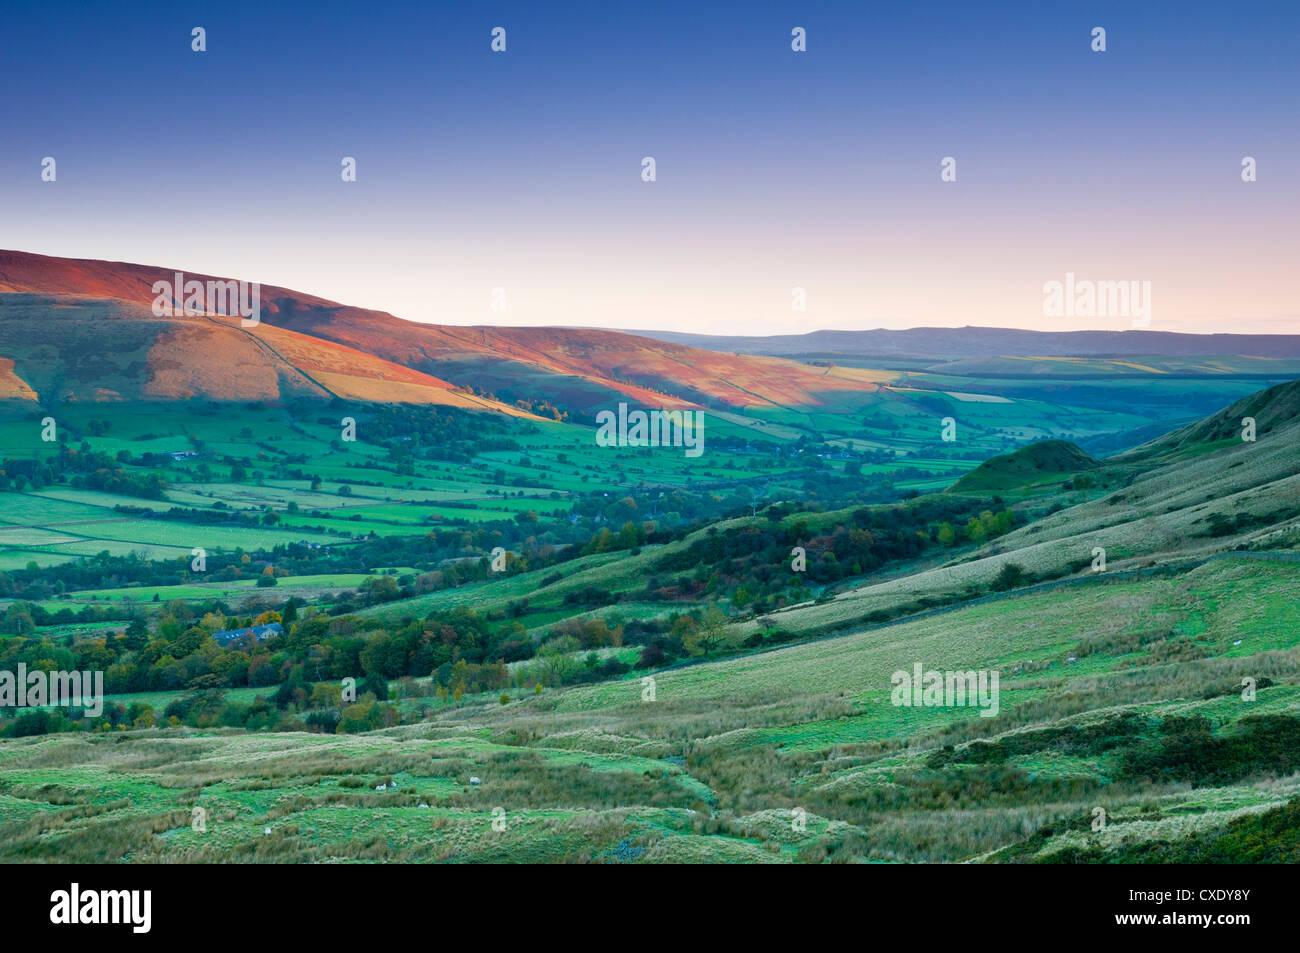 Vale of Edale, Peak District National Park, Derbyshire, England - Stock Image